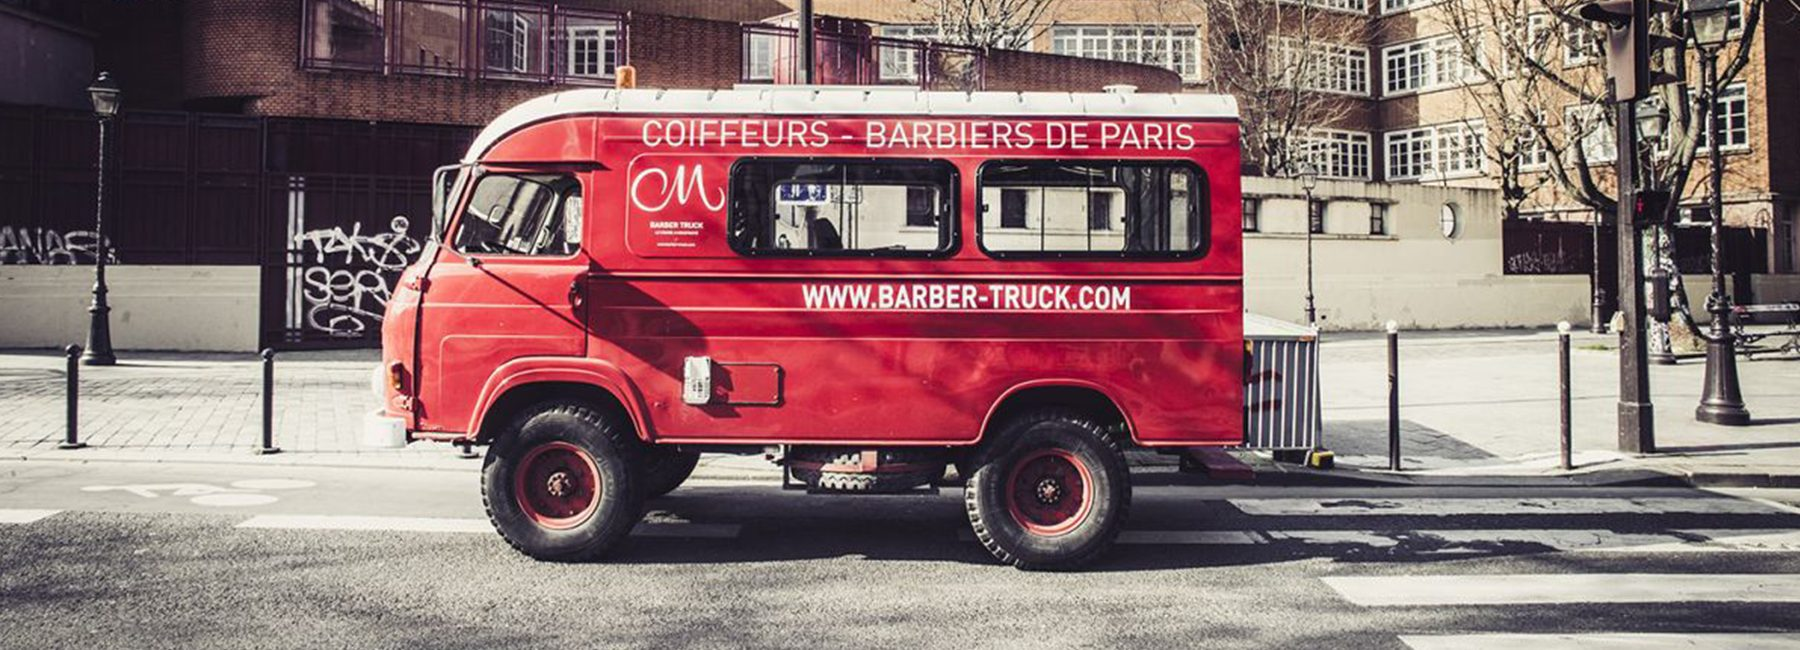 Barber truck Cigare à Moustache